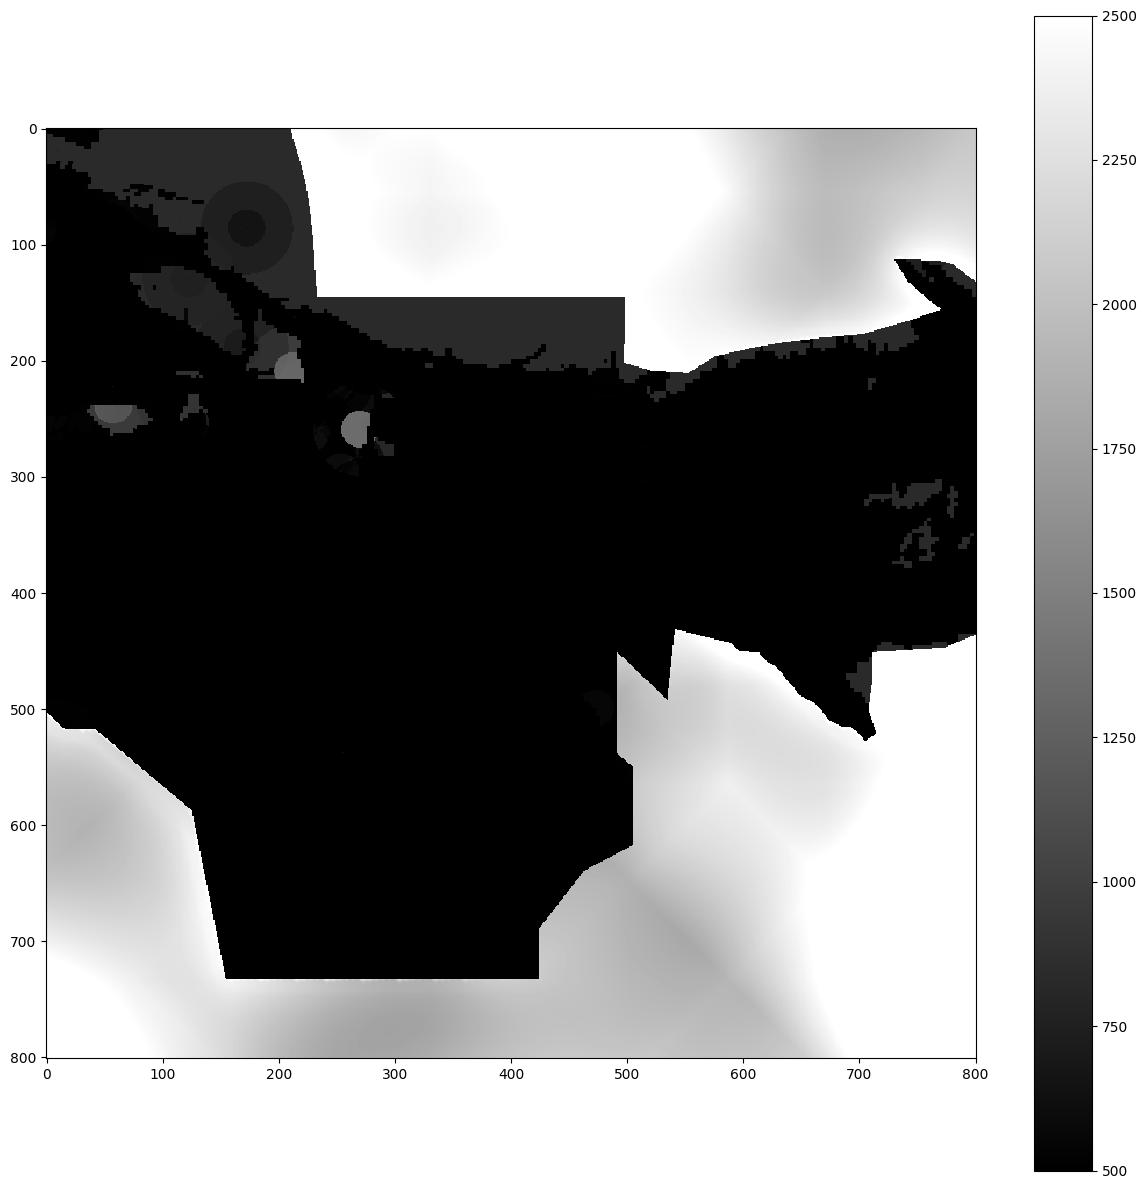 bench/seismic/wp/la_habra/meshes/velocity_model/plots/vs_10.png